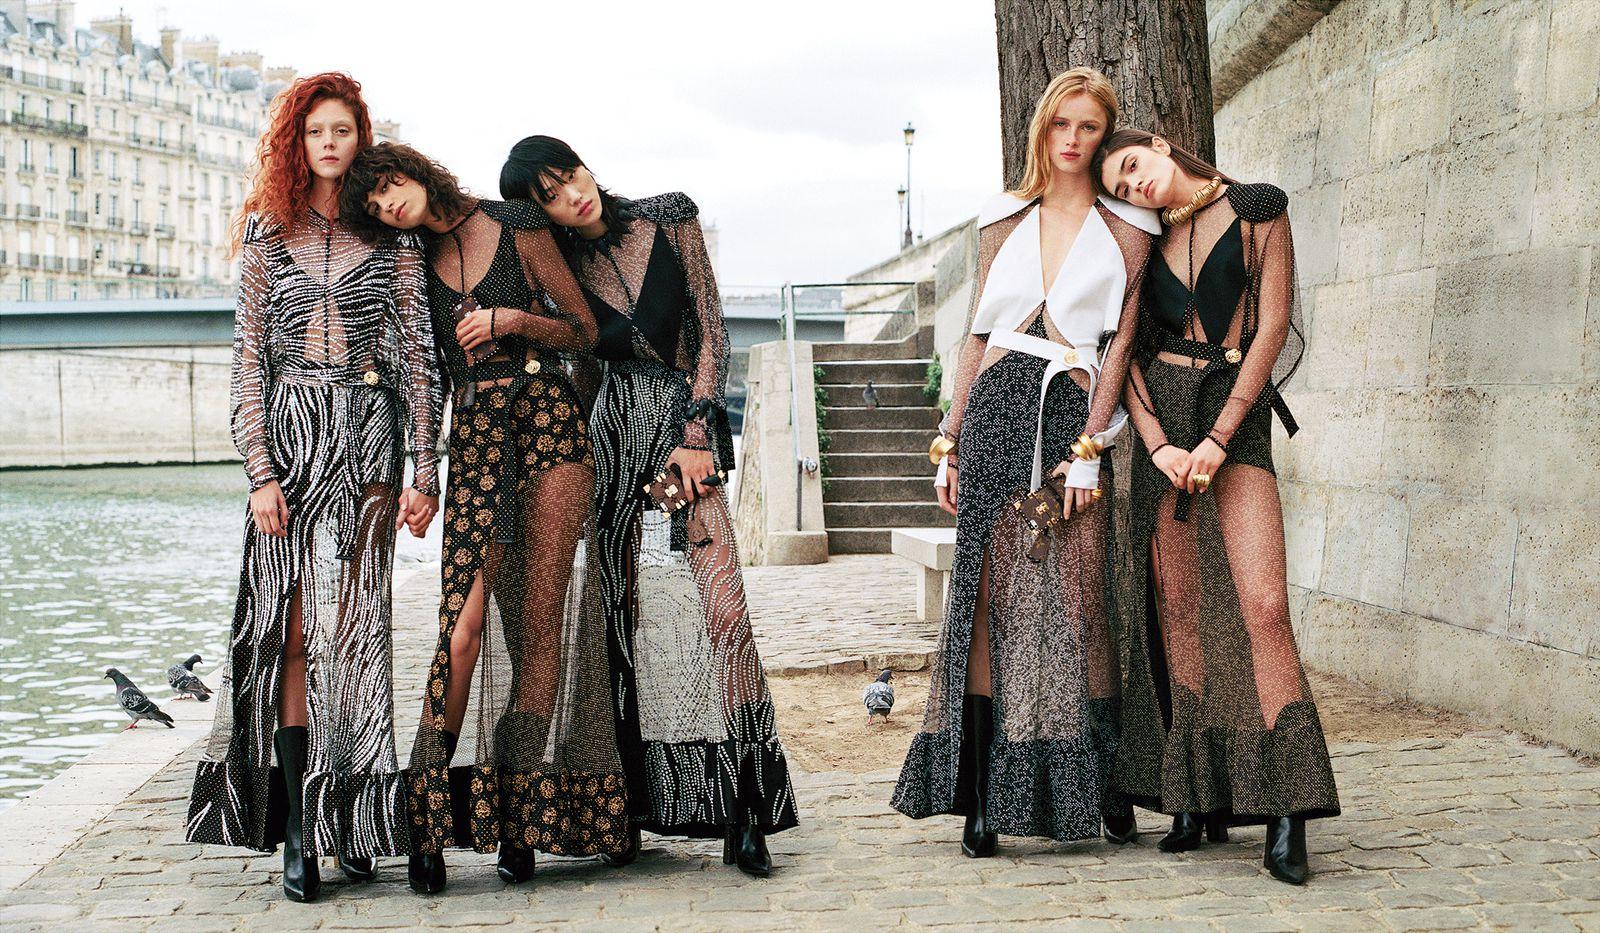 BTS Videos: Louis Vuitton's Series 6 FULL  Ad Campaign